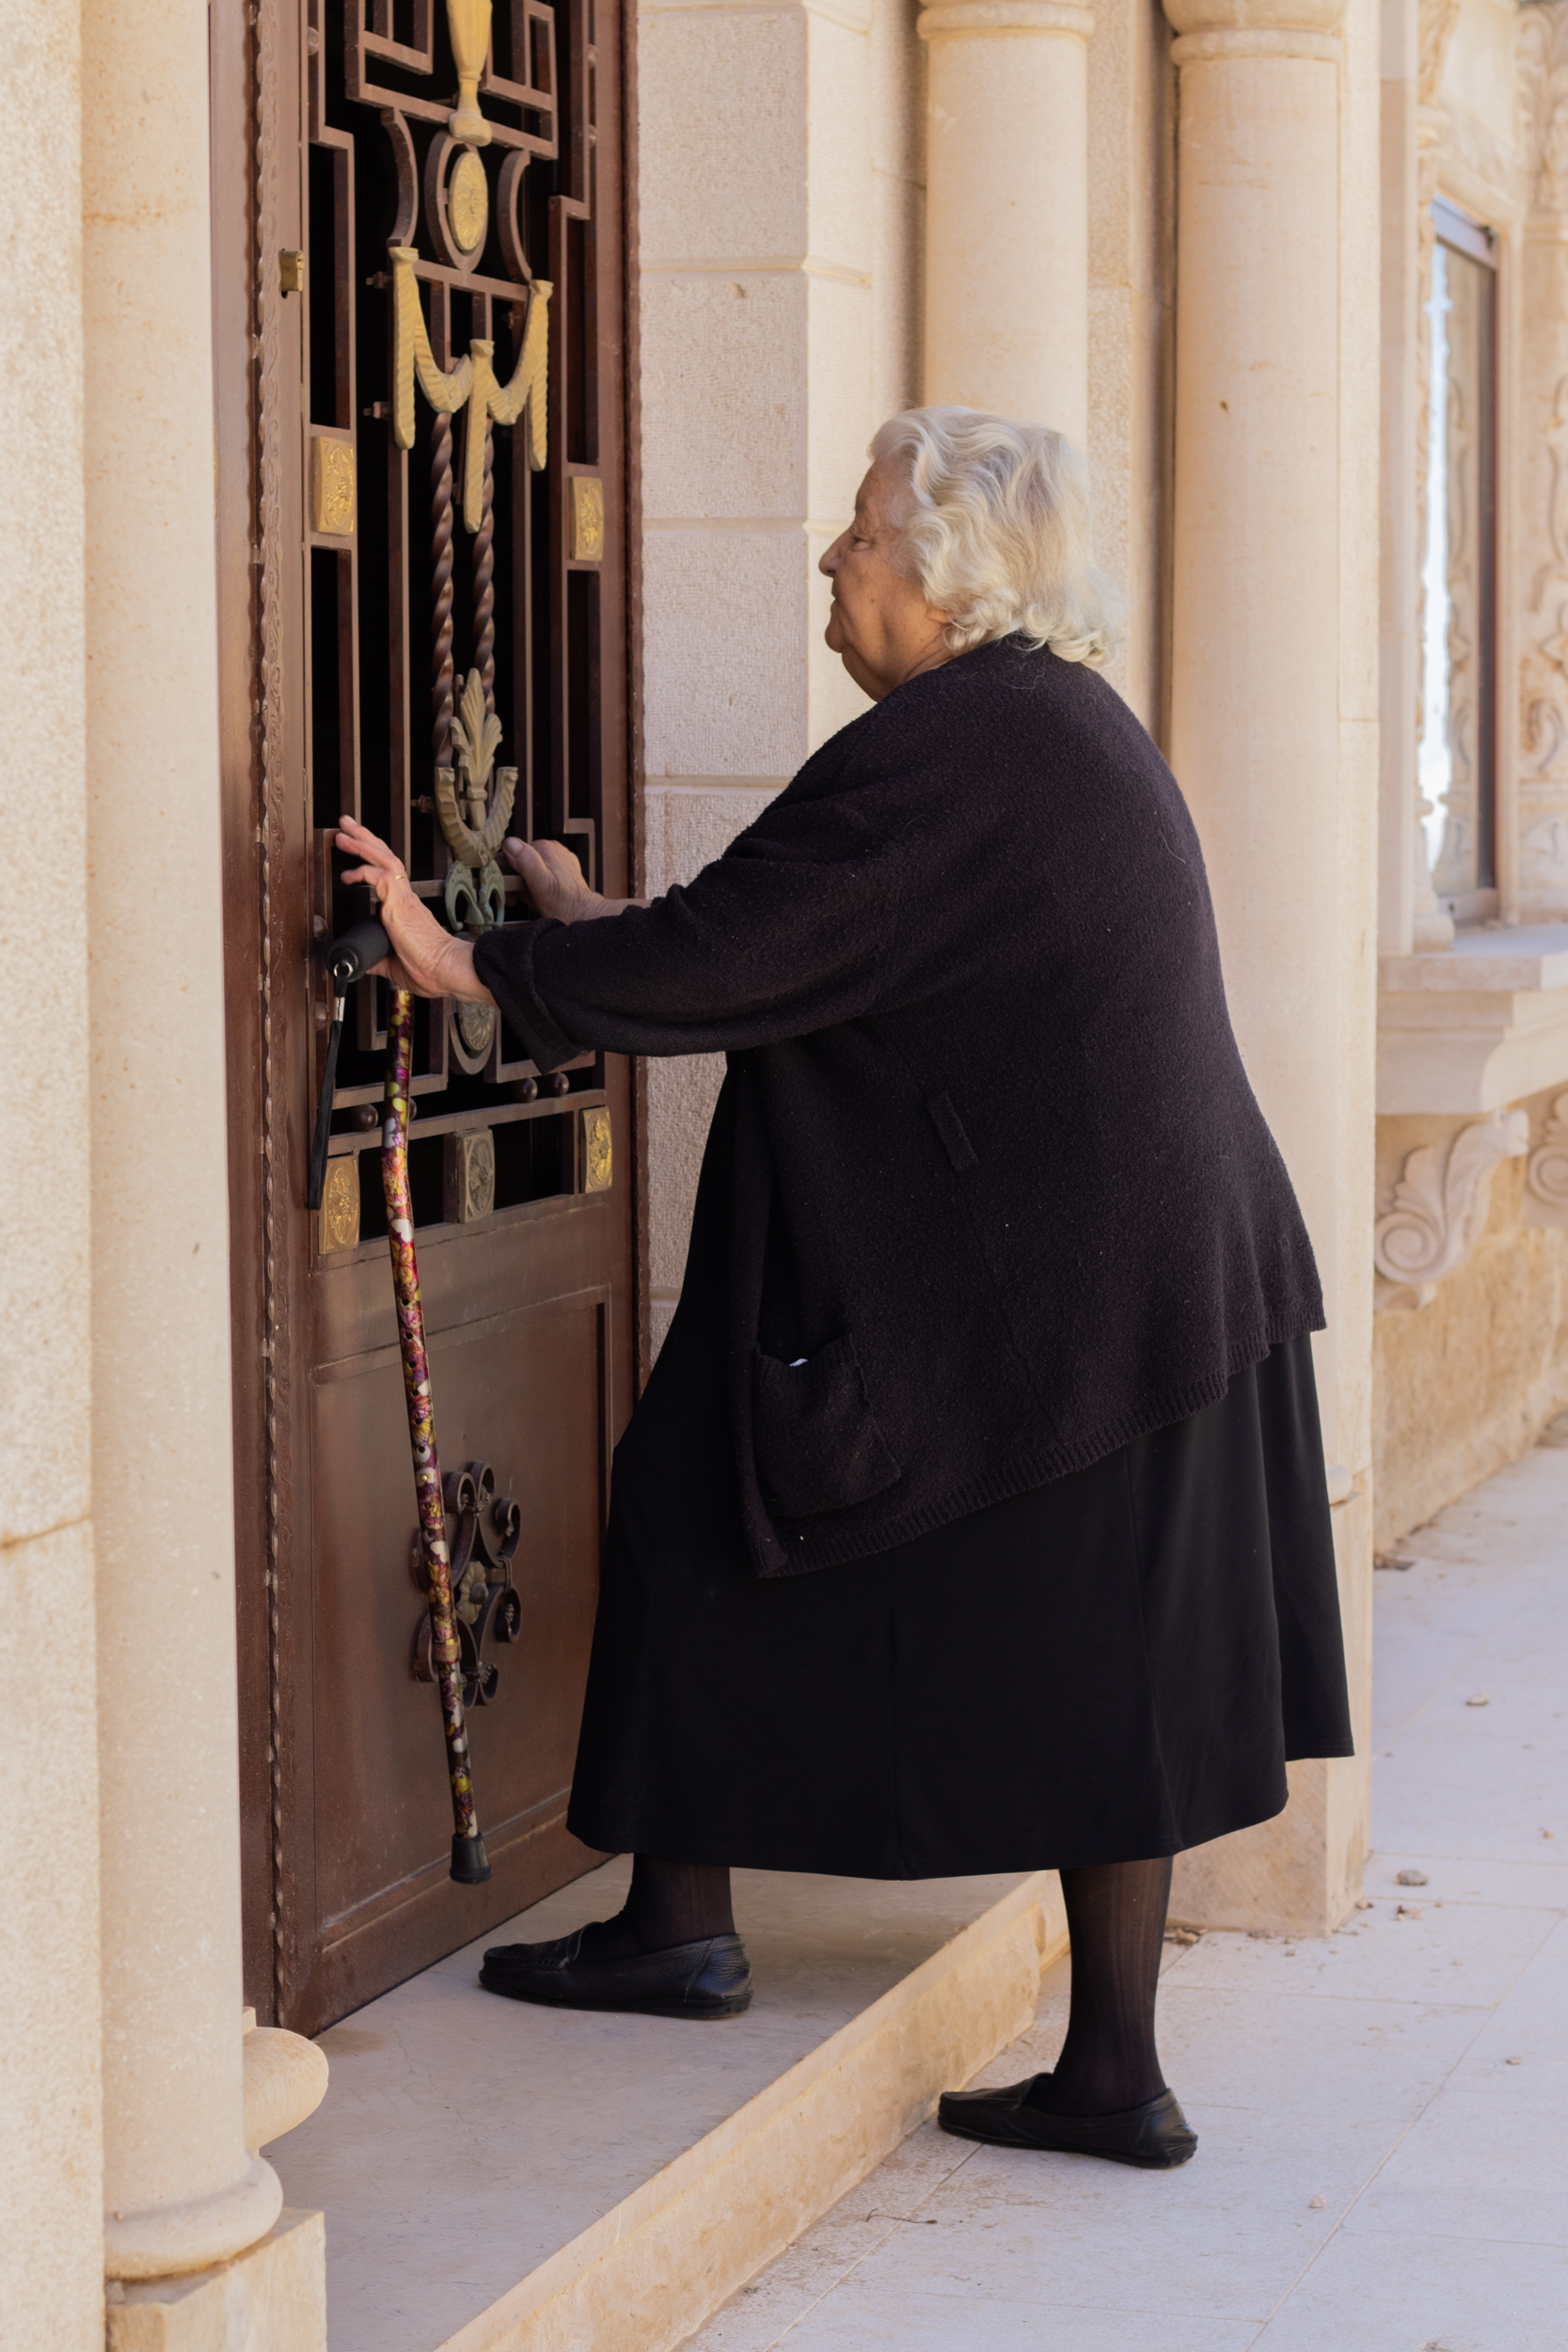 Grandma's Great Posture. 84 Yrs Old, No Back Pain